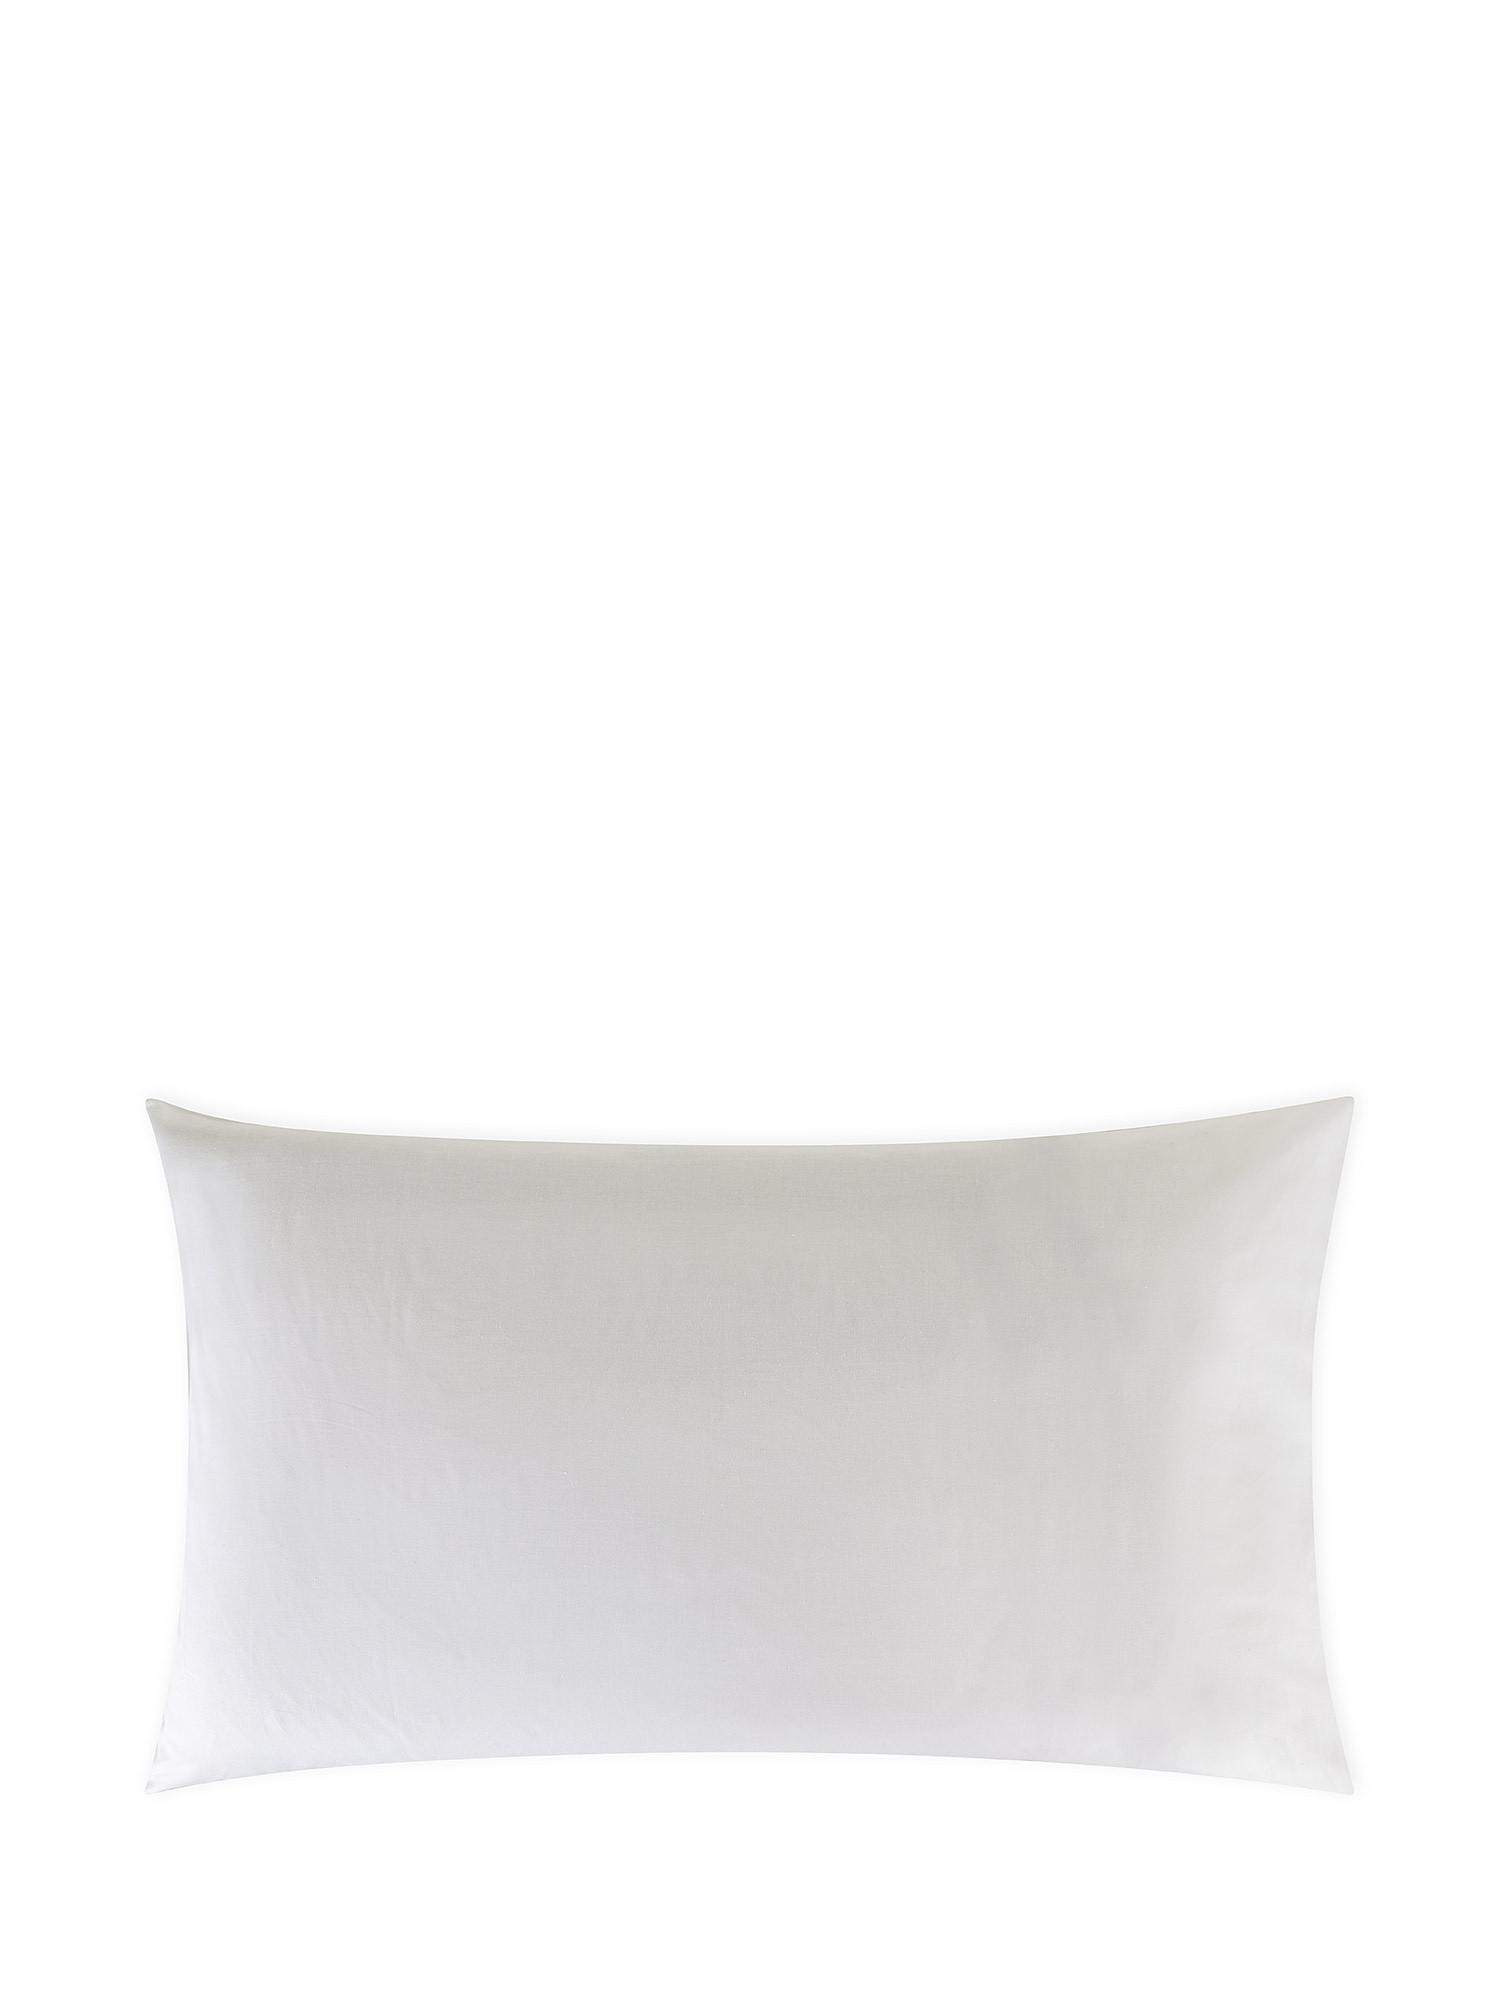 Federa puro cotone tinta unita, Bianco, large image number 0